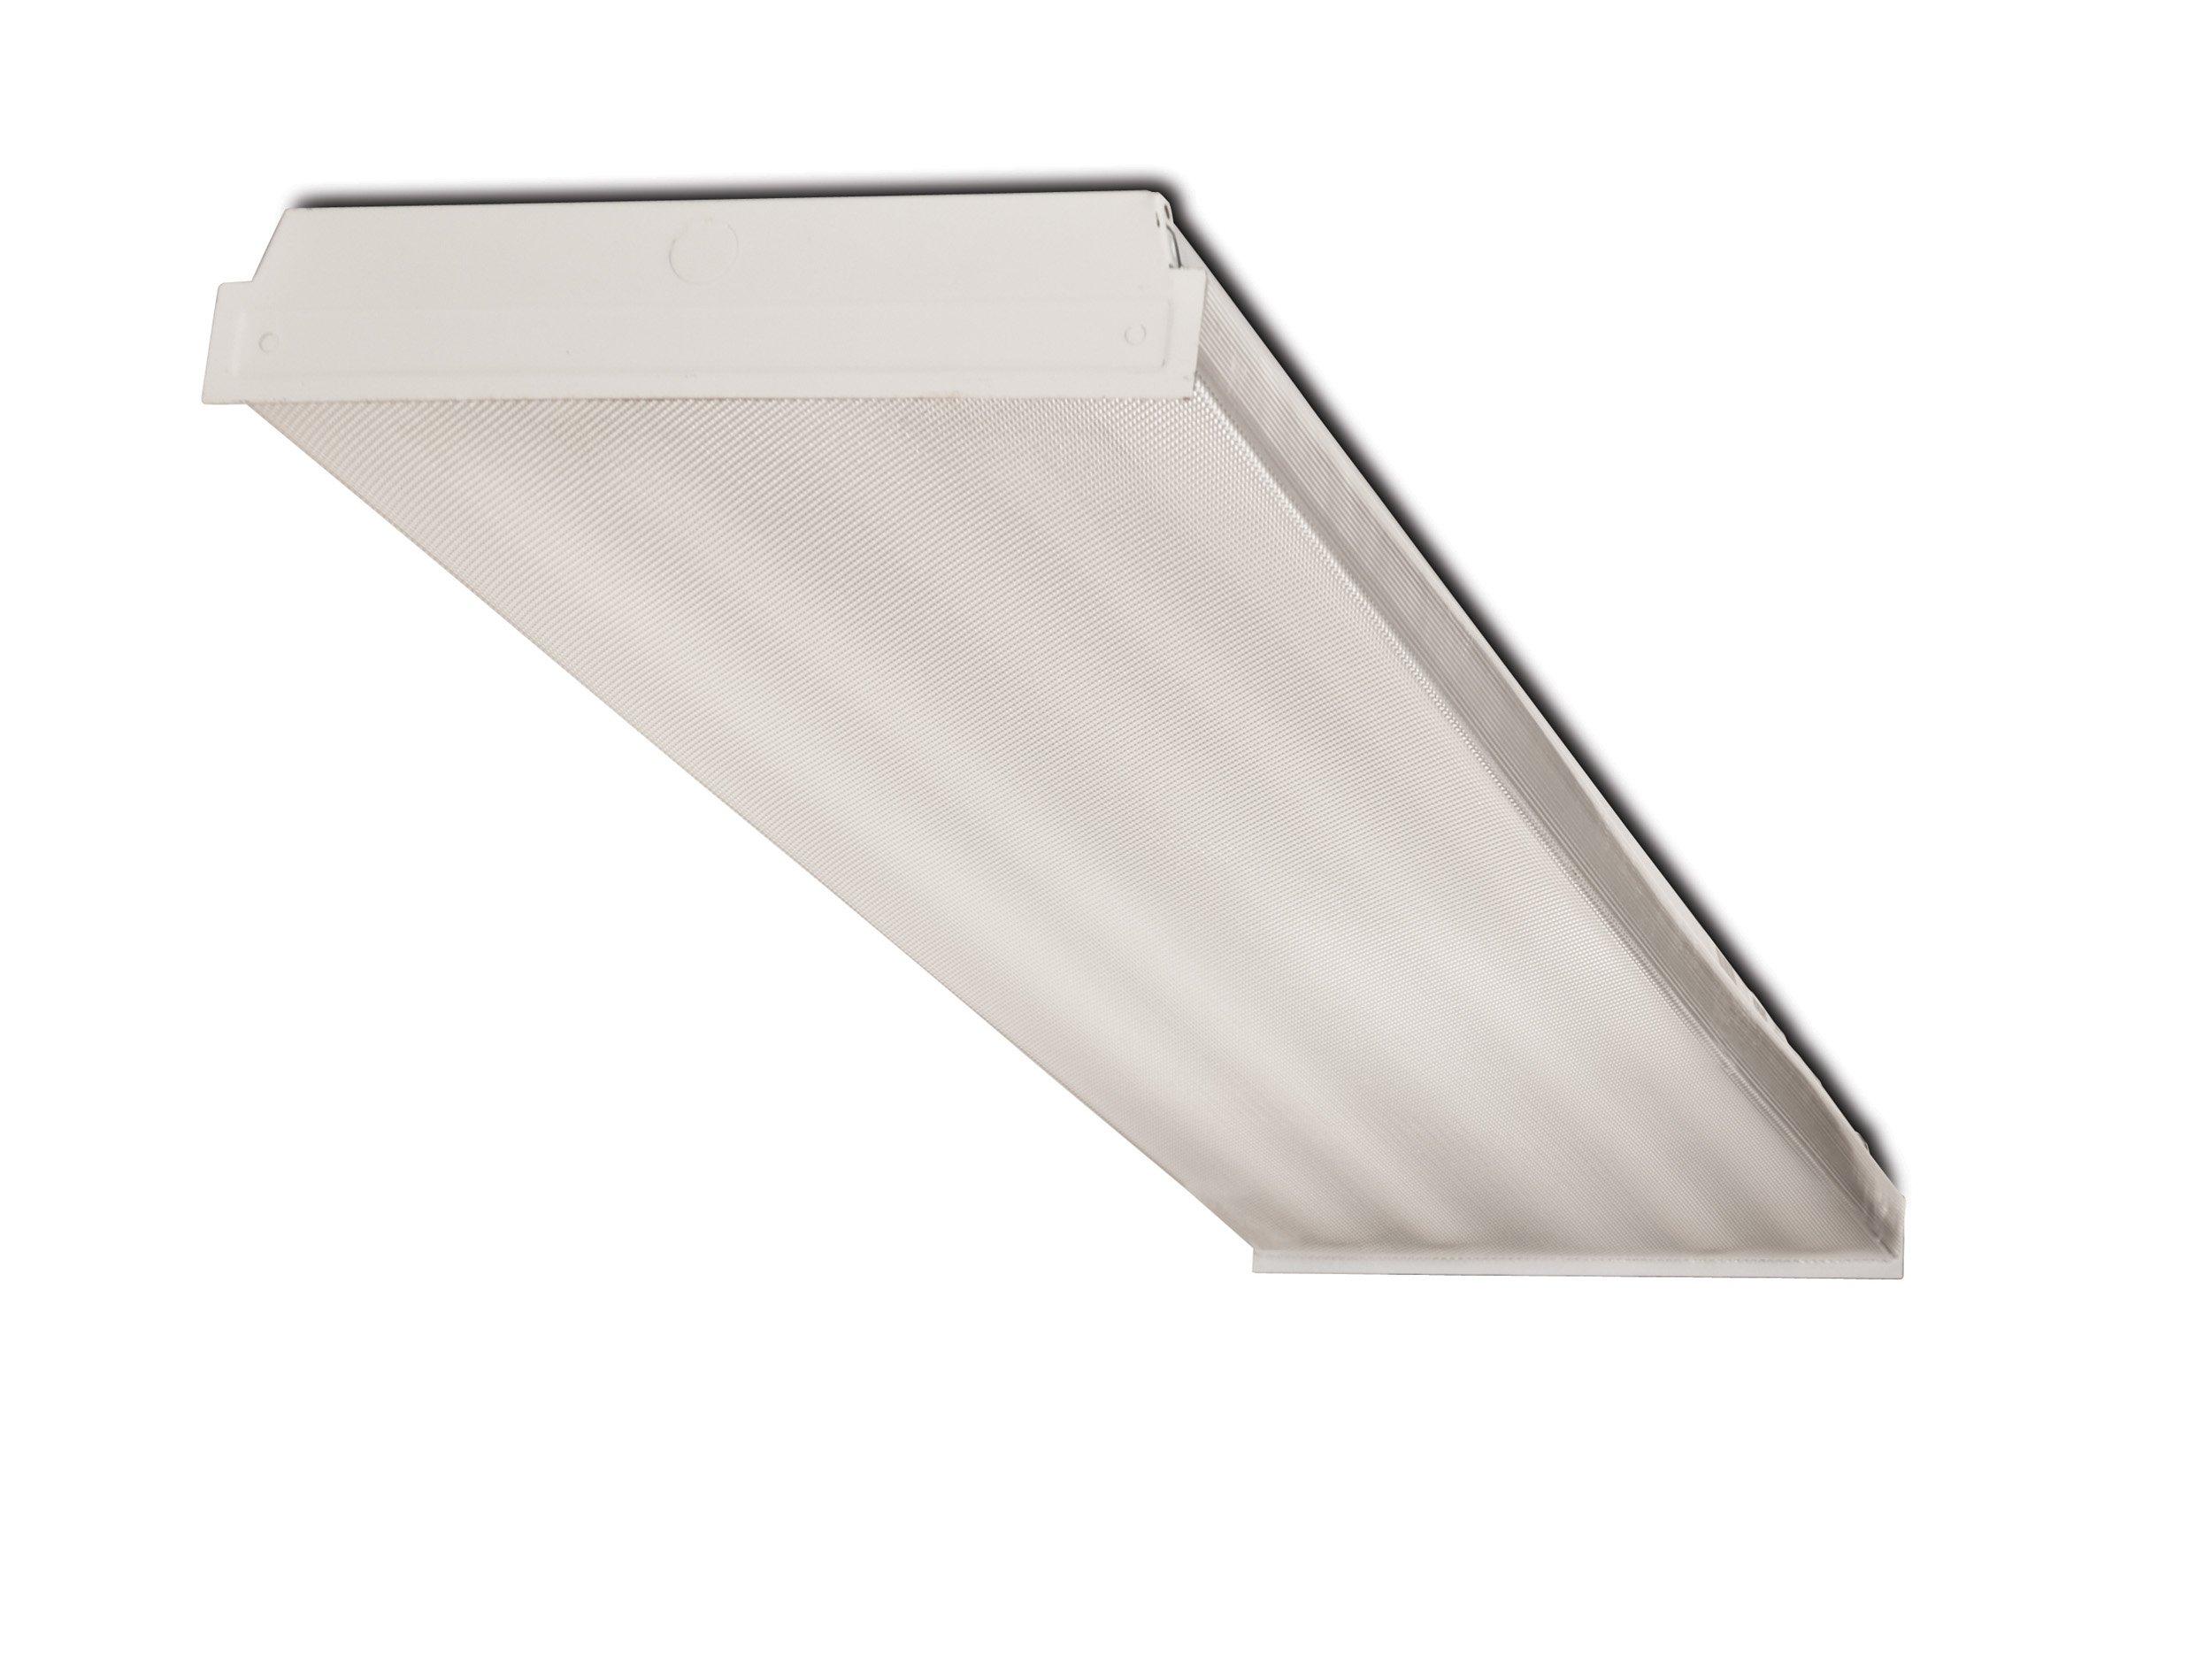 Howard Lighting CW440432ASEMV 4' 4 Lamp 32W T8 Fluorescent Wrap Fixture